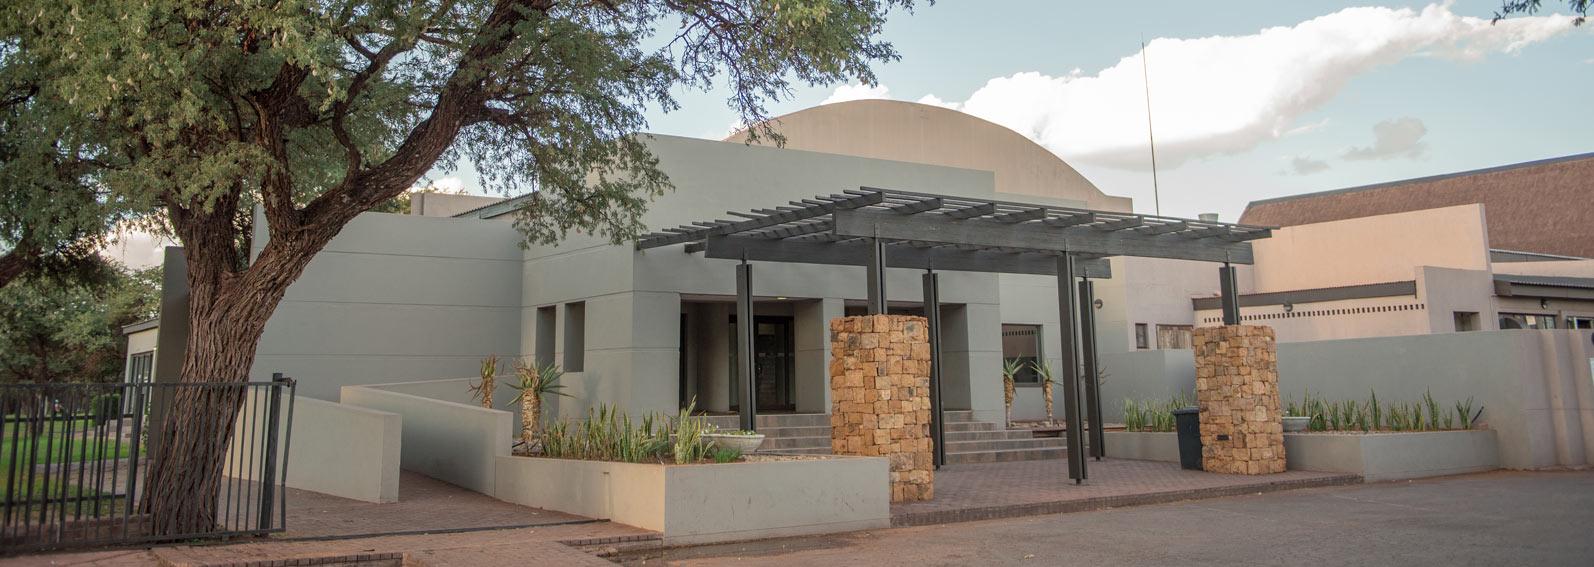 KCC Conference Facilities